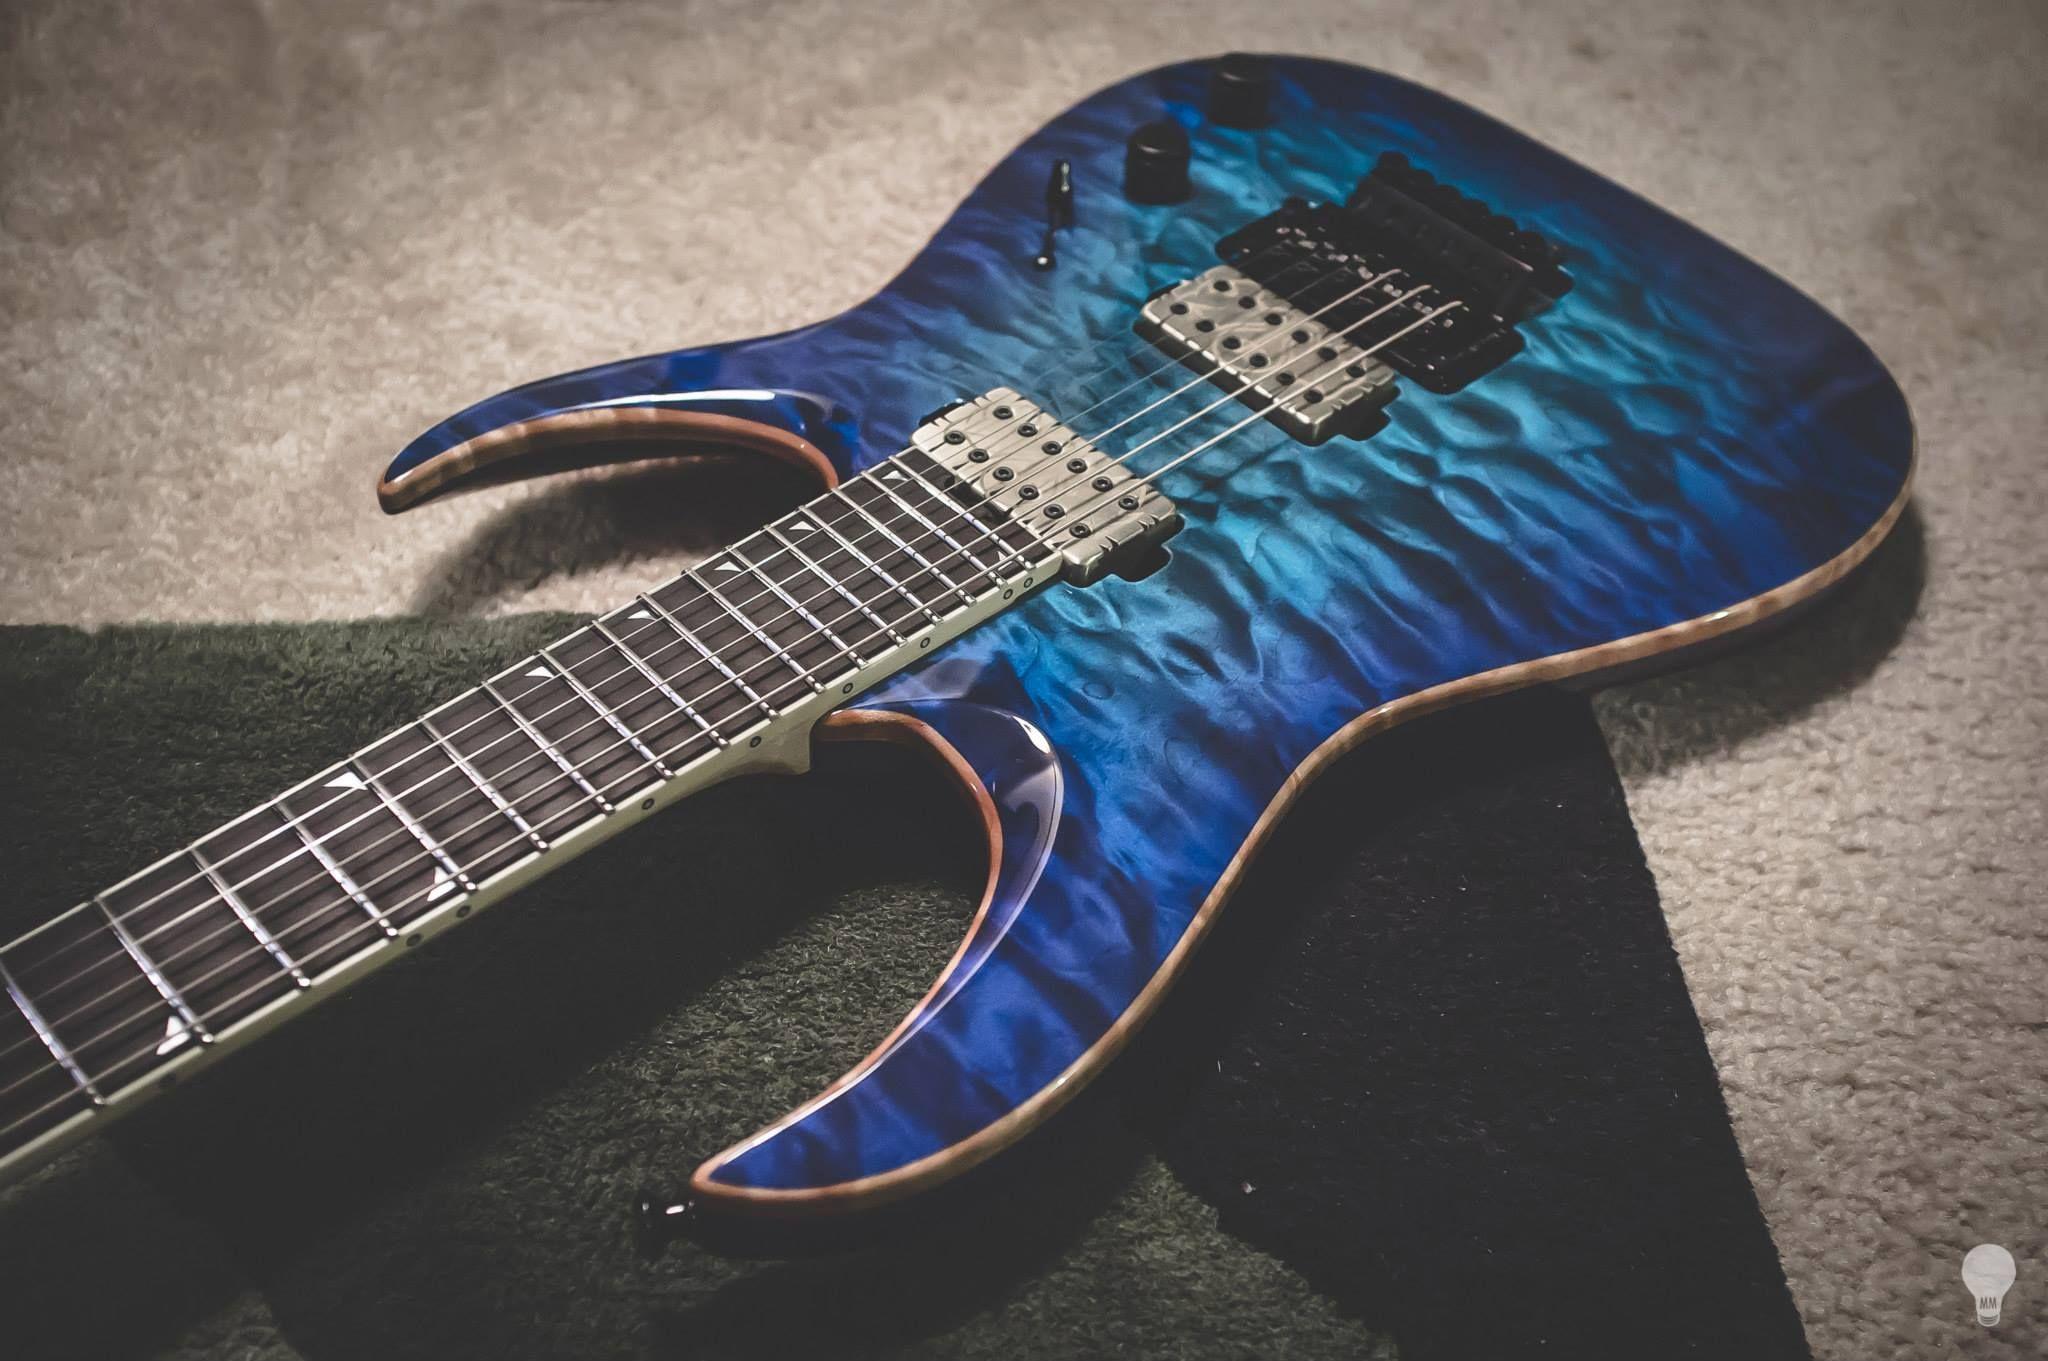 jackson custom shop for misha mansoor riffage jackson guitars beautiful guitars guitar. Black Bedroom Furniture Sets. Home Design Ideas